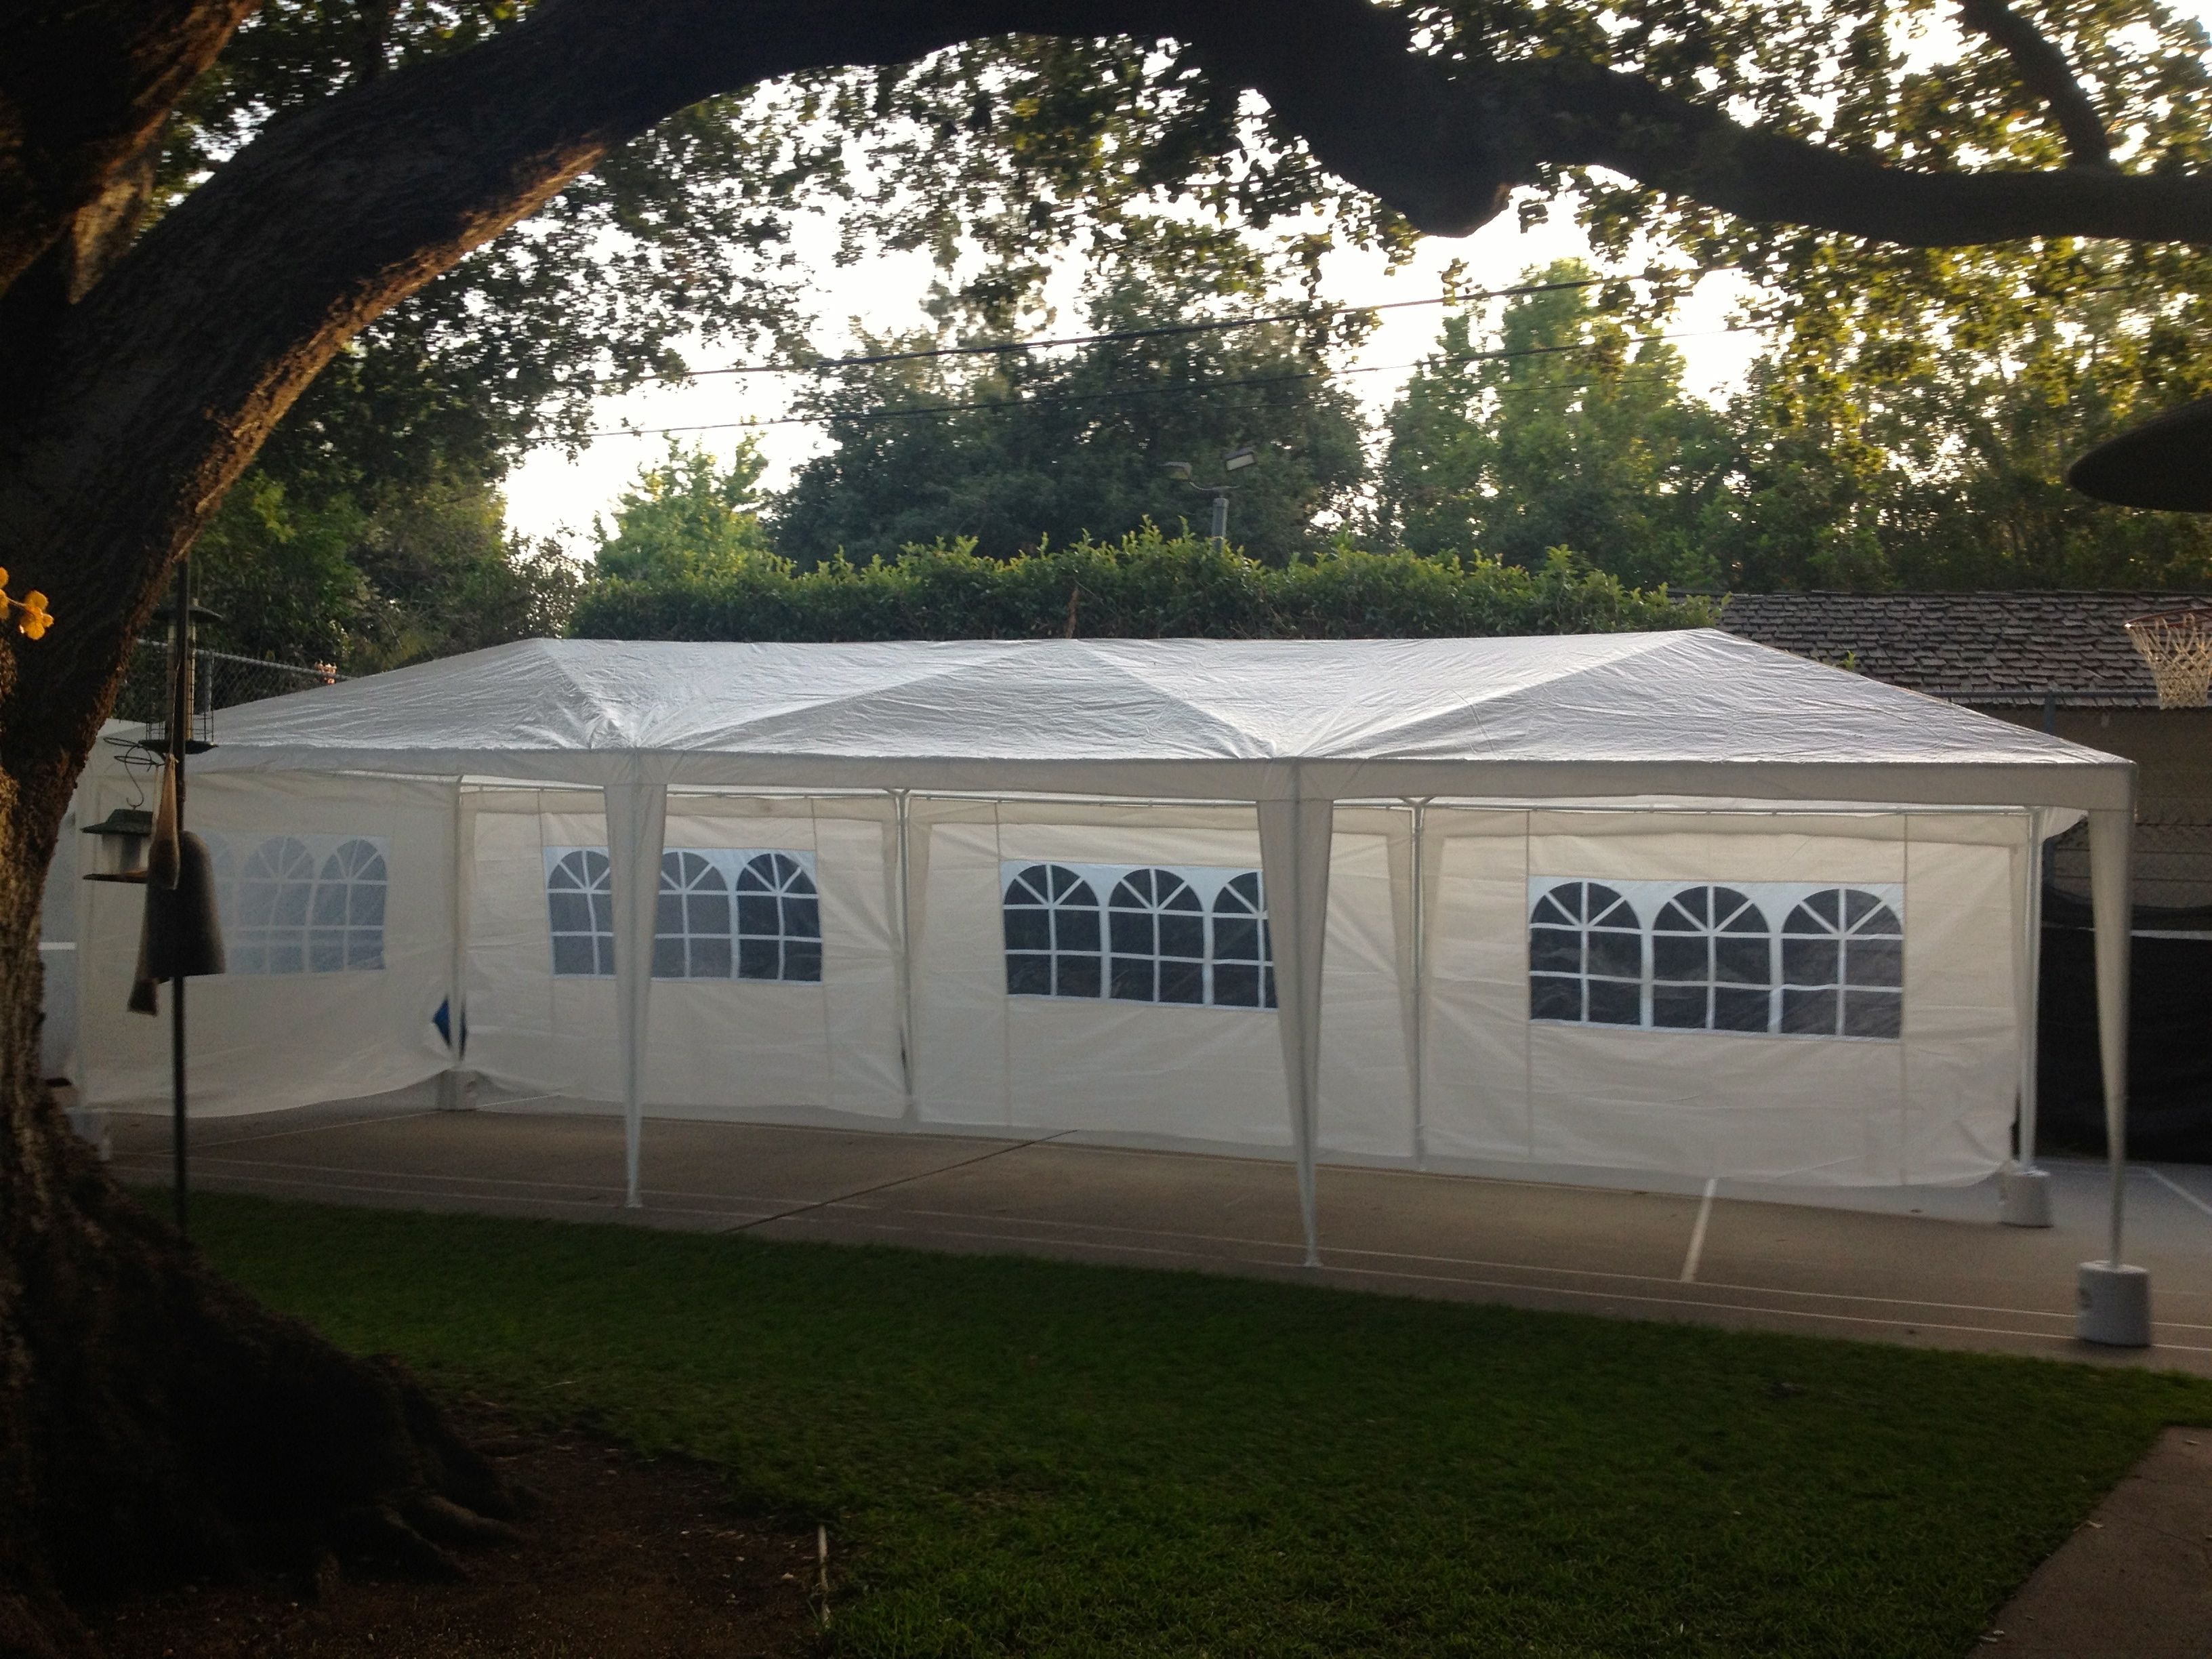 Party Tent In Backyard : Published November 23, 2013 Fullsize 3264 ? 2448